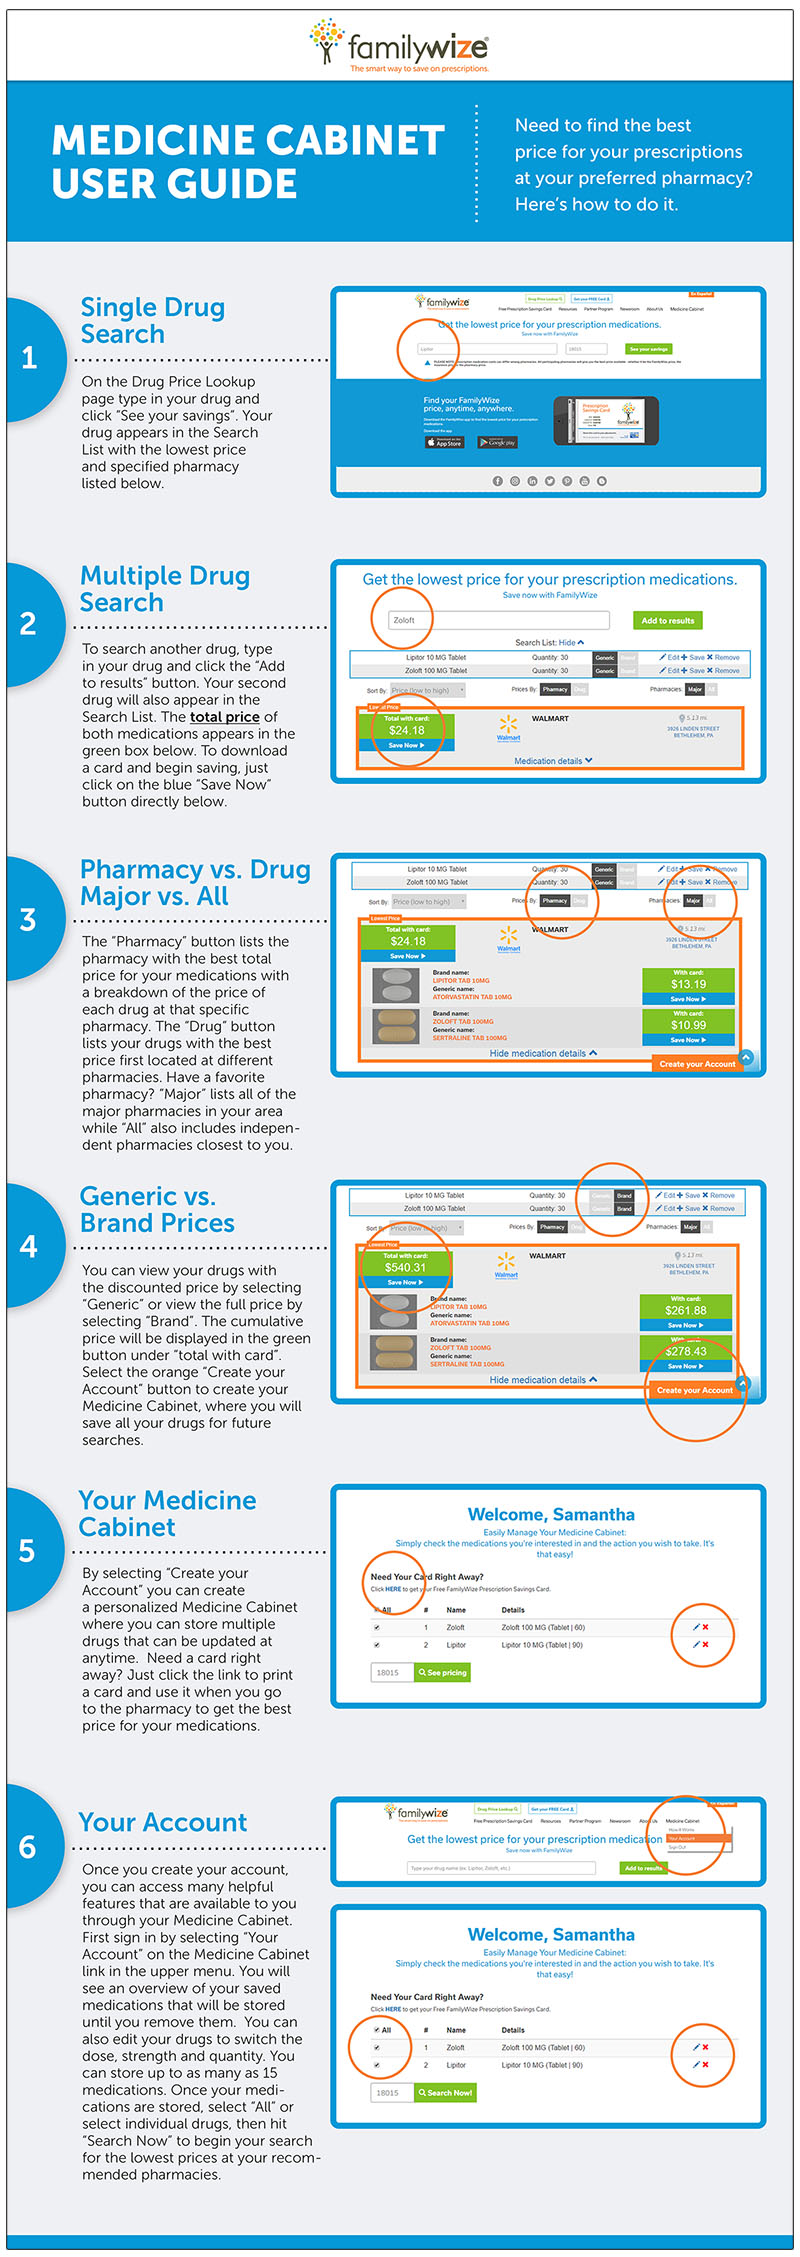 Medicine Cabinet User Guide